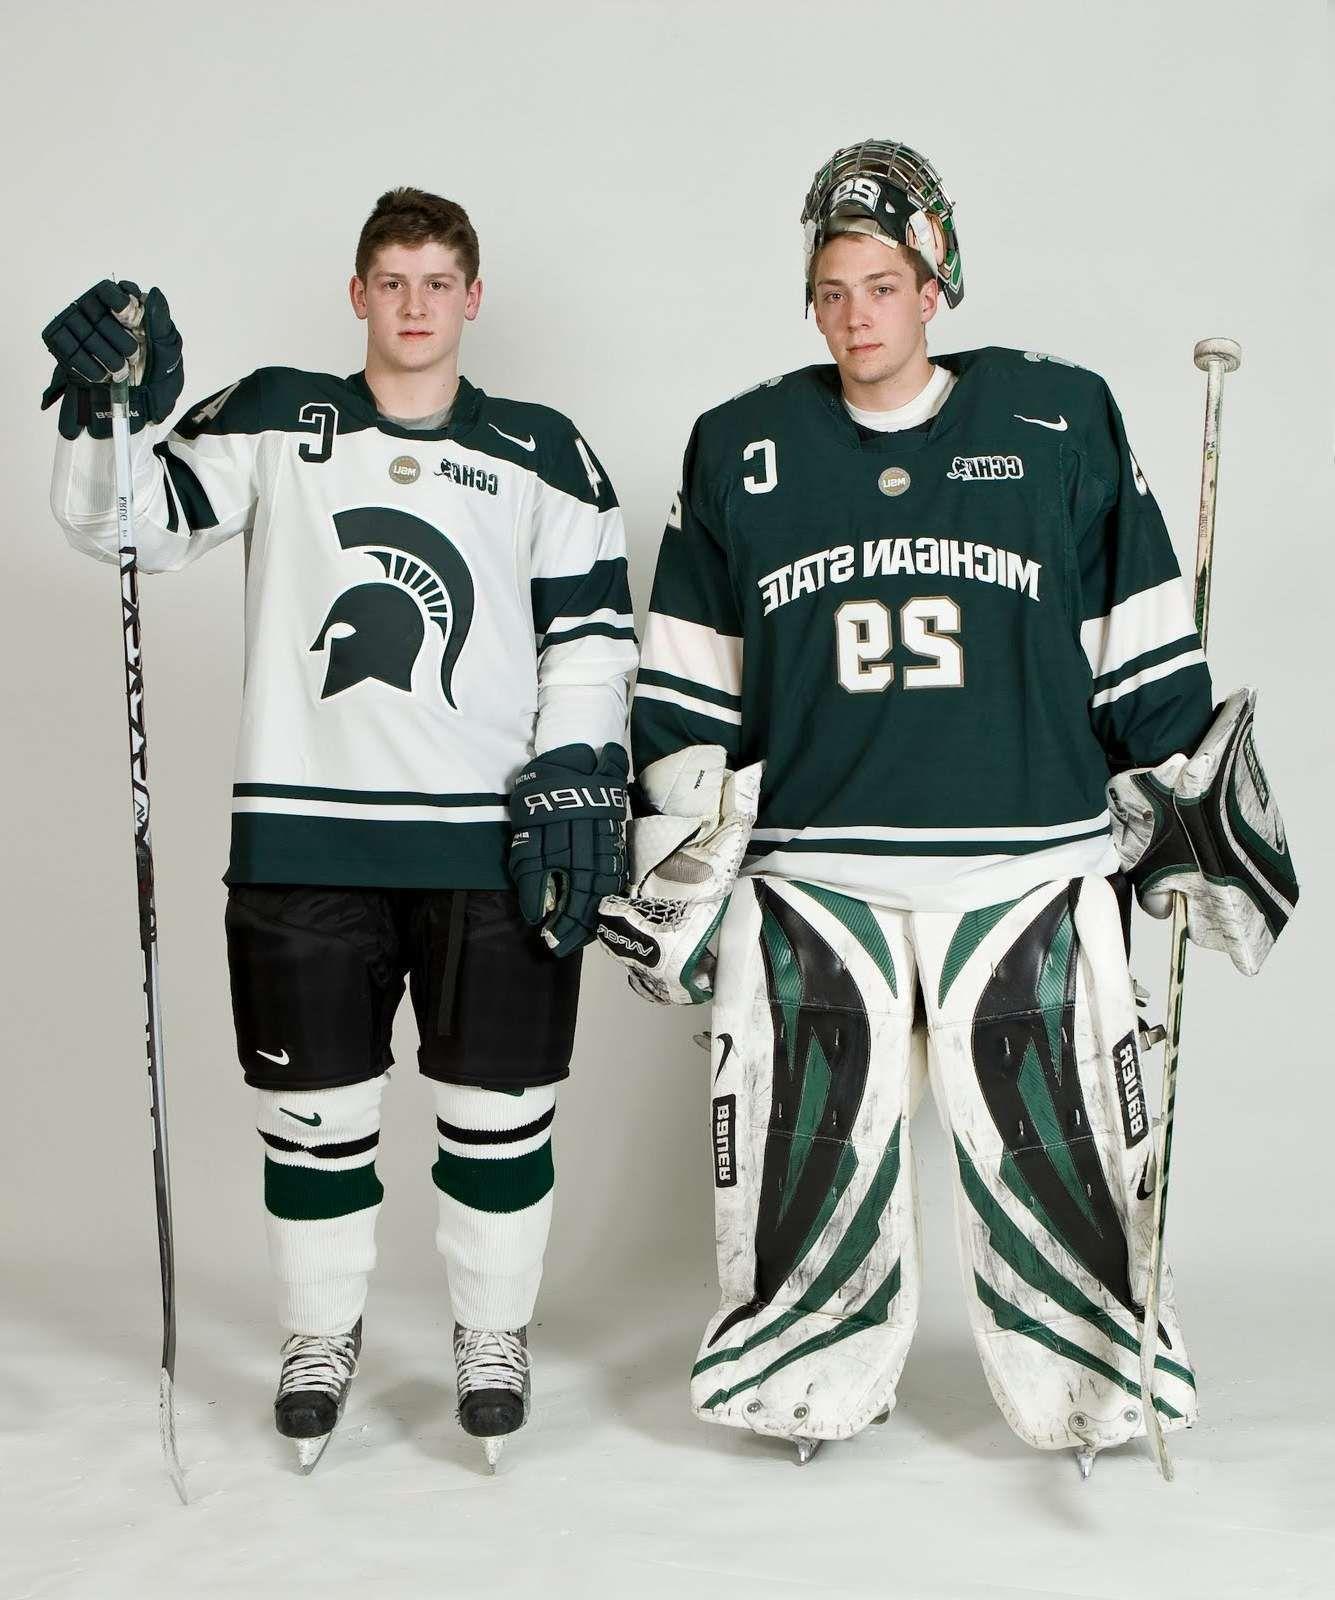 Awesome Michigan State Hockey Apparel Hockey Clothes Hockey Uniforms Team Sportswear